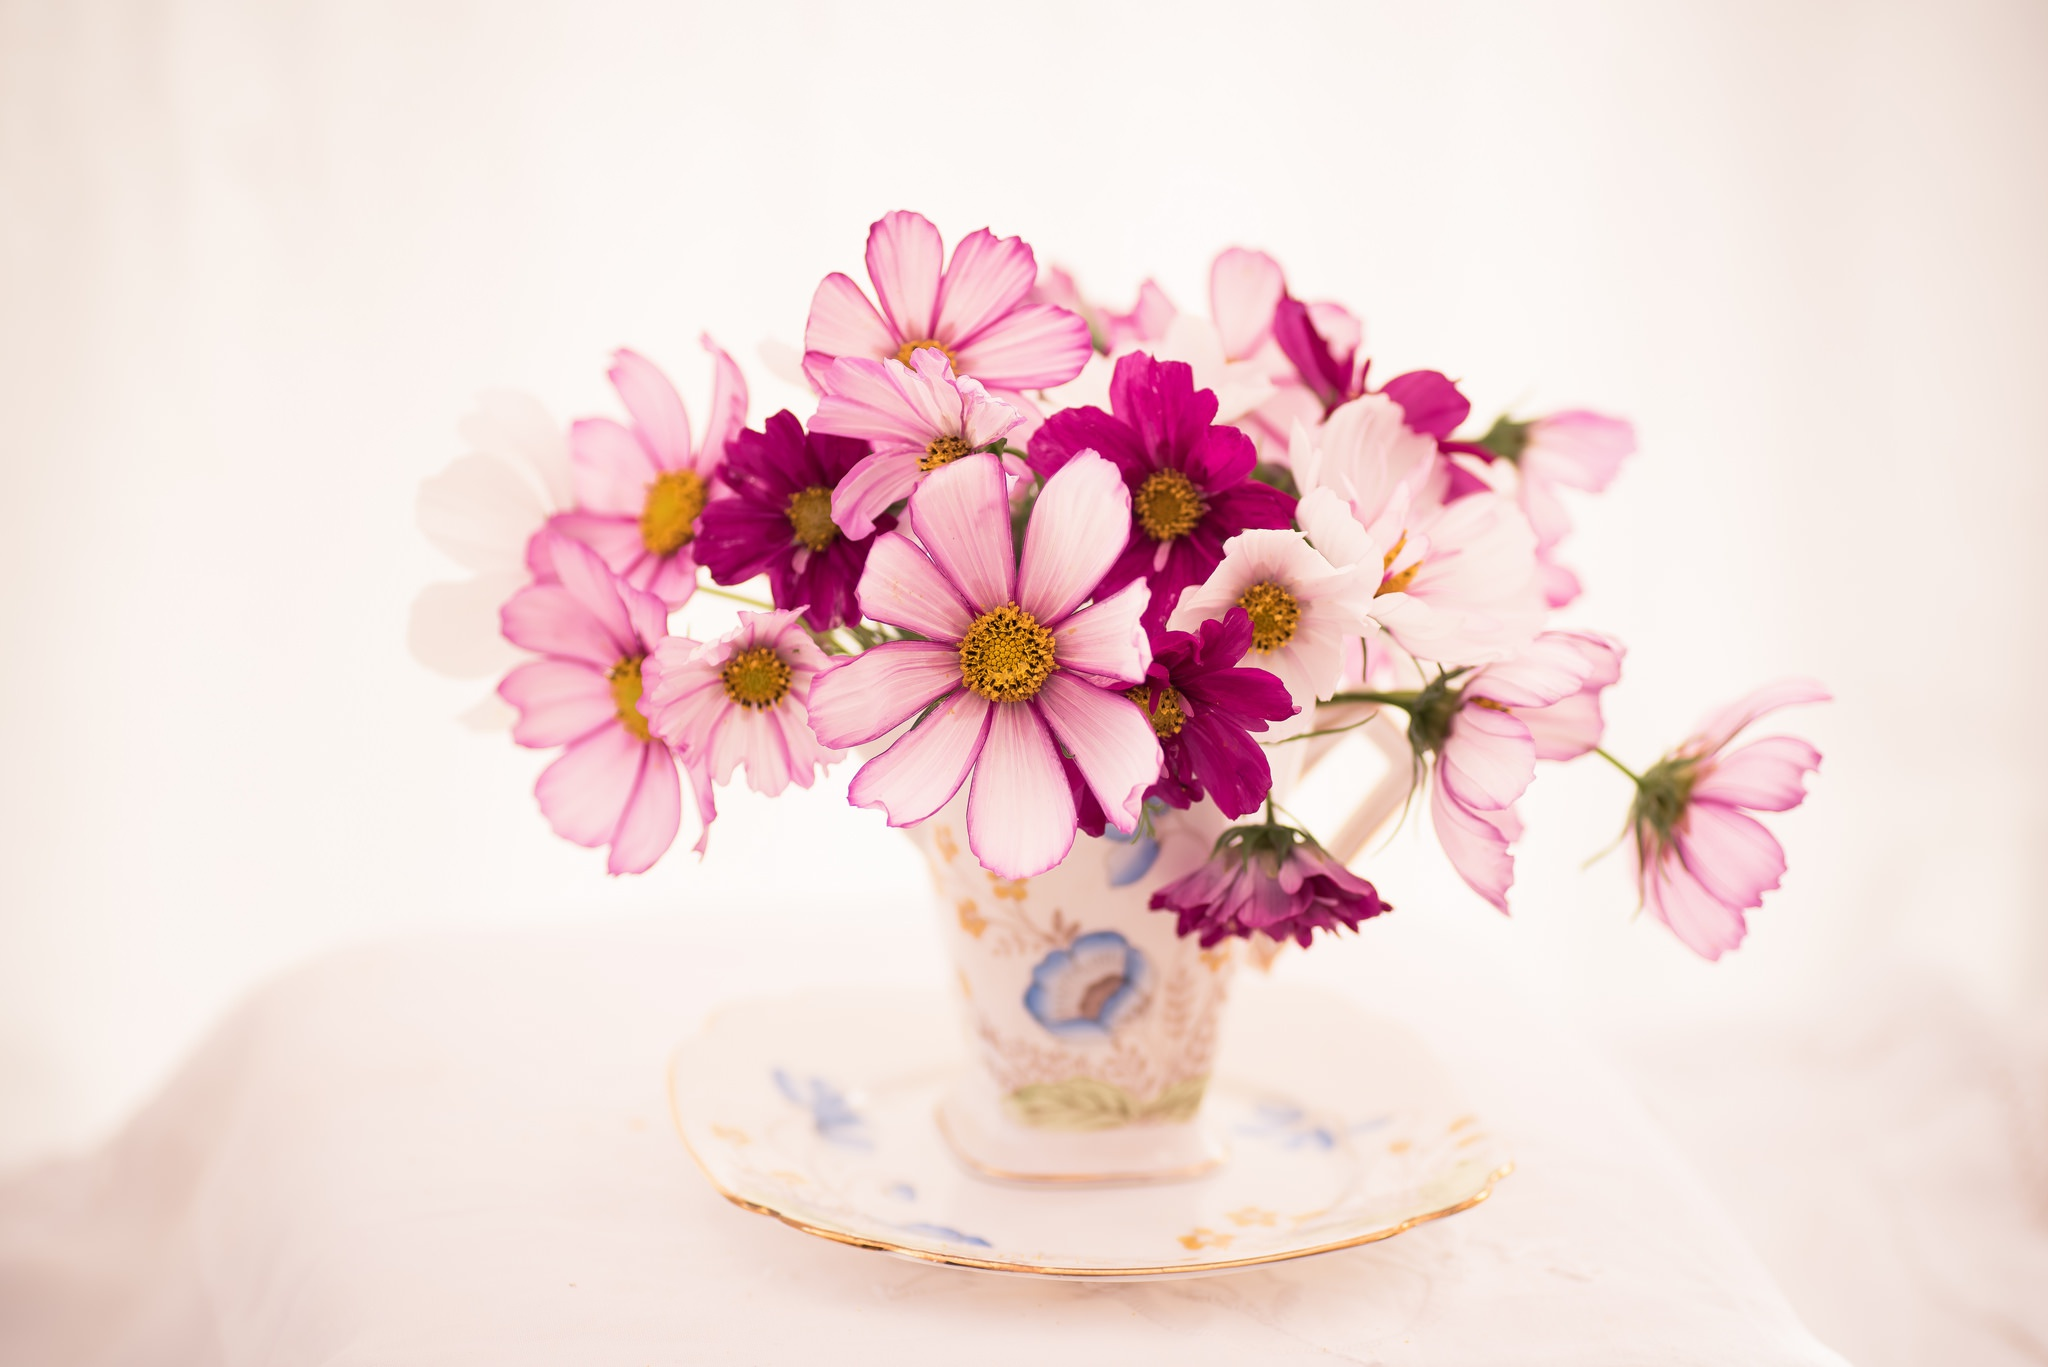 Цветок космея букеты фото, букет каталог киев